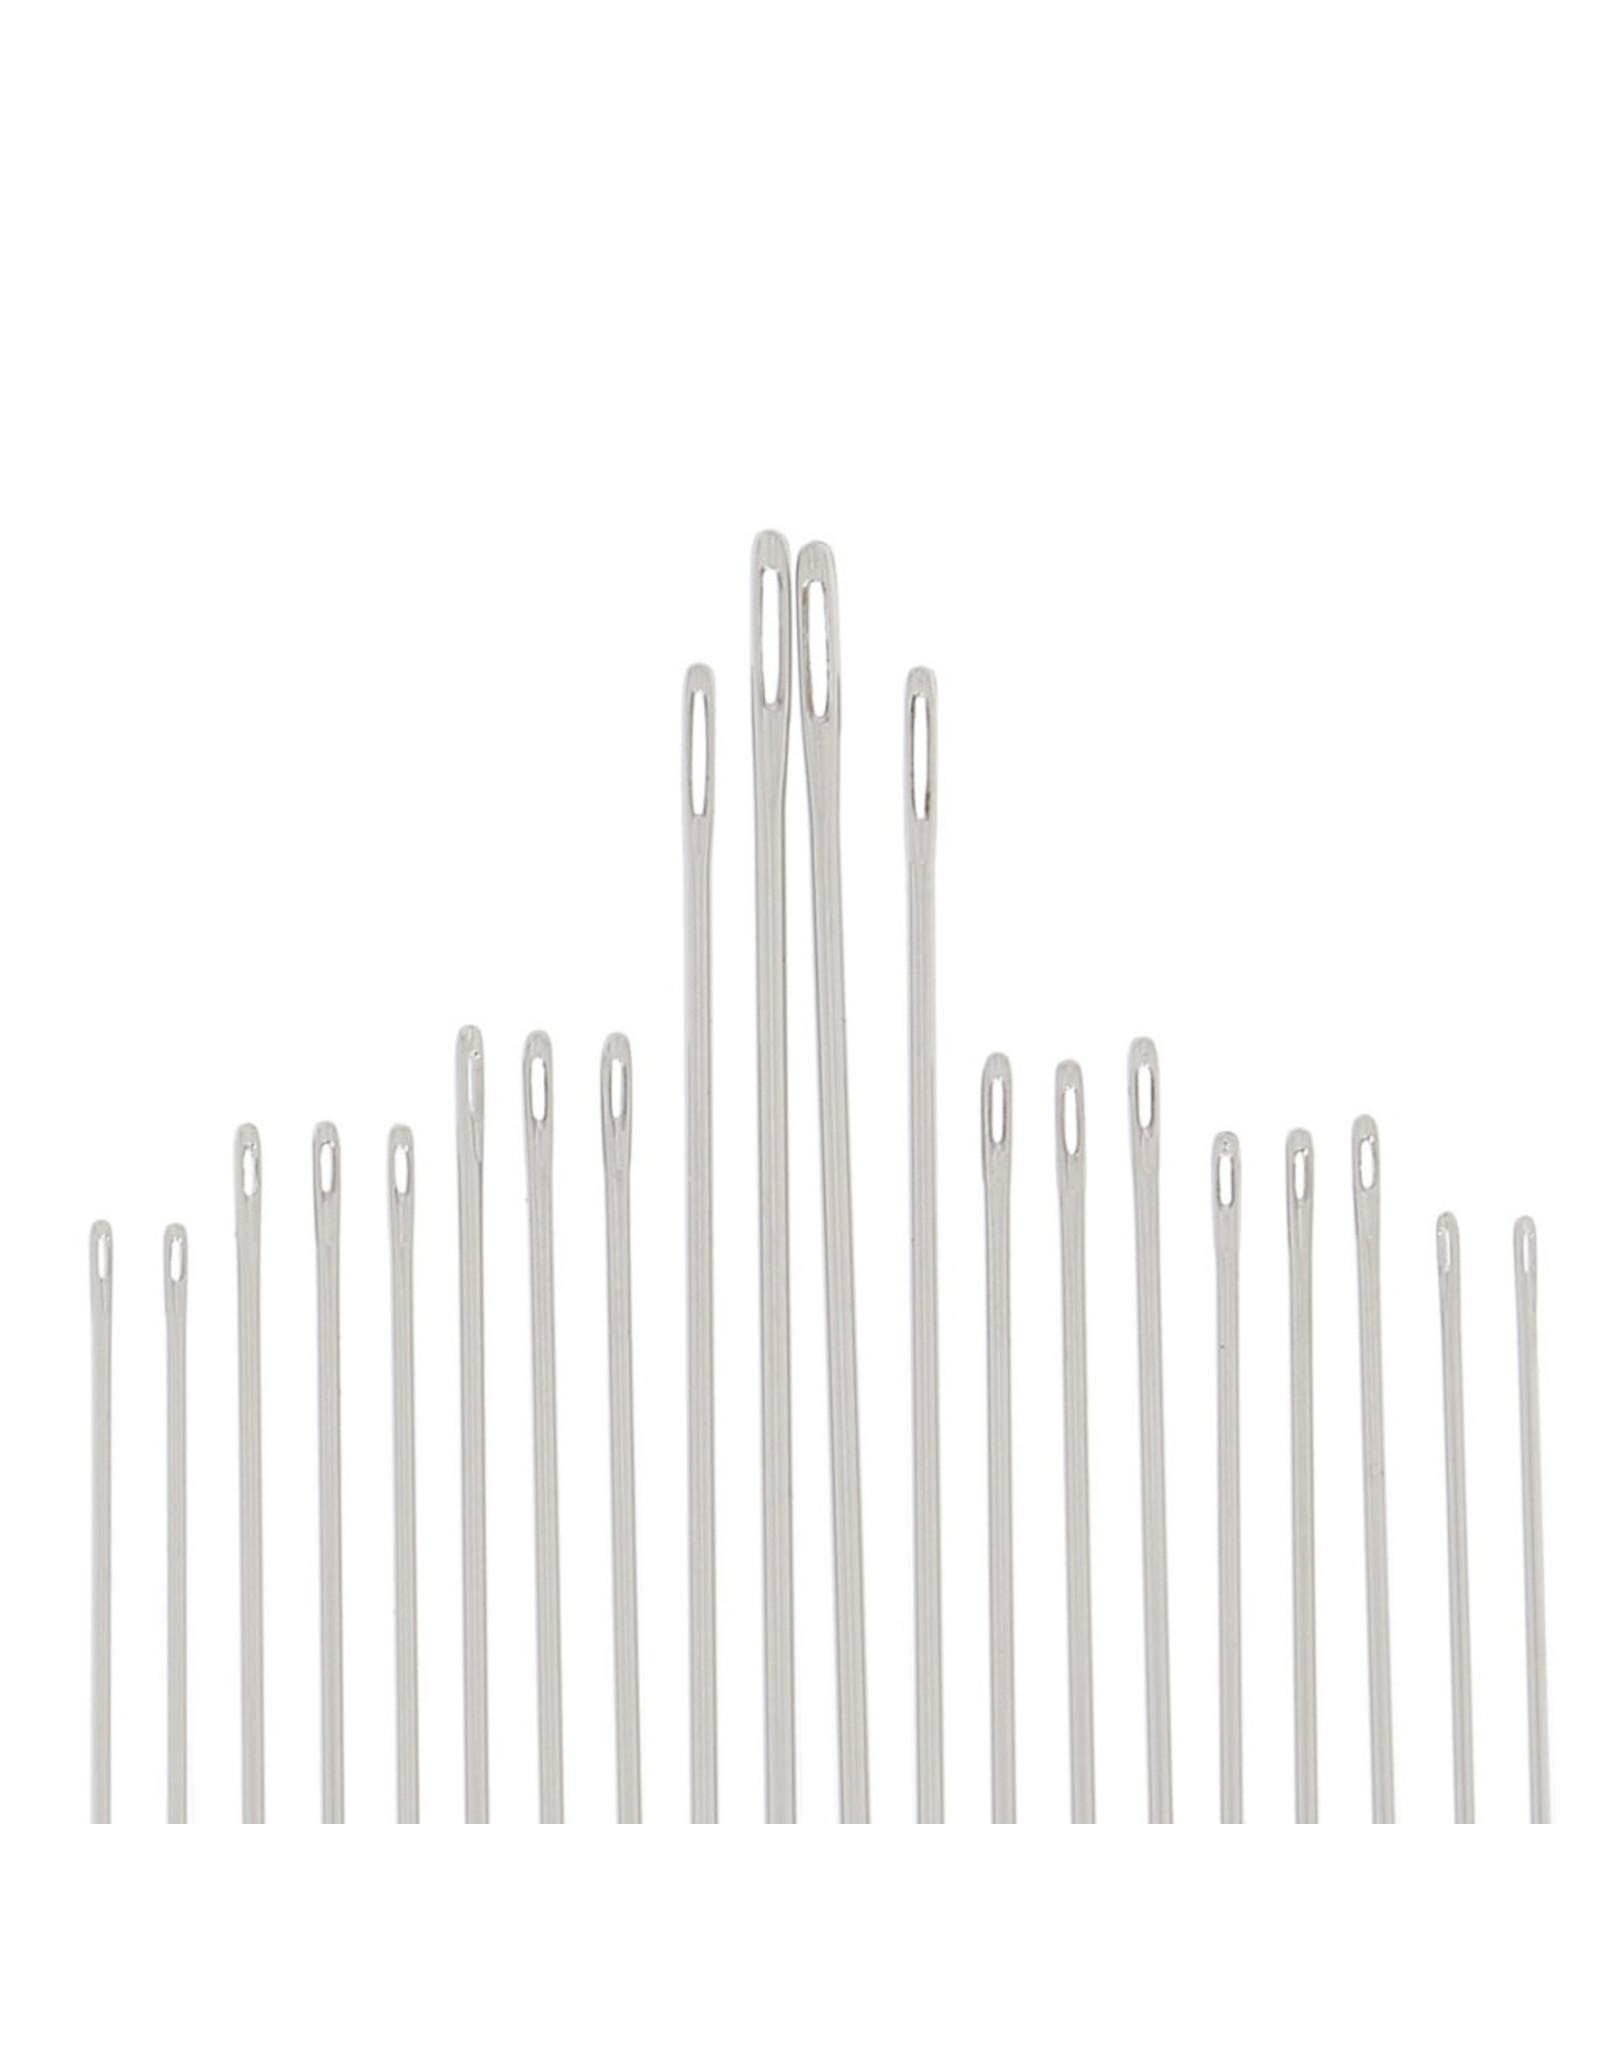 Bohin Sewing and Long Darner Needles, Assorted Sizes -20 ct., Bohin